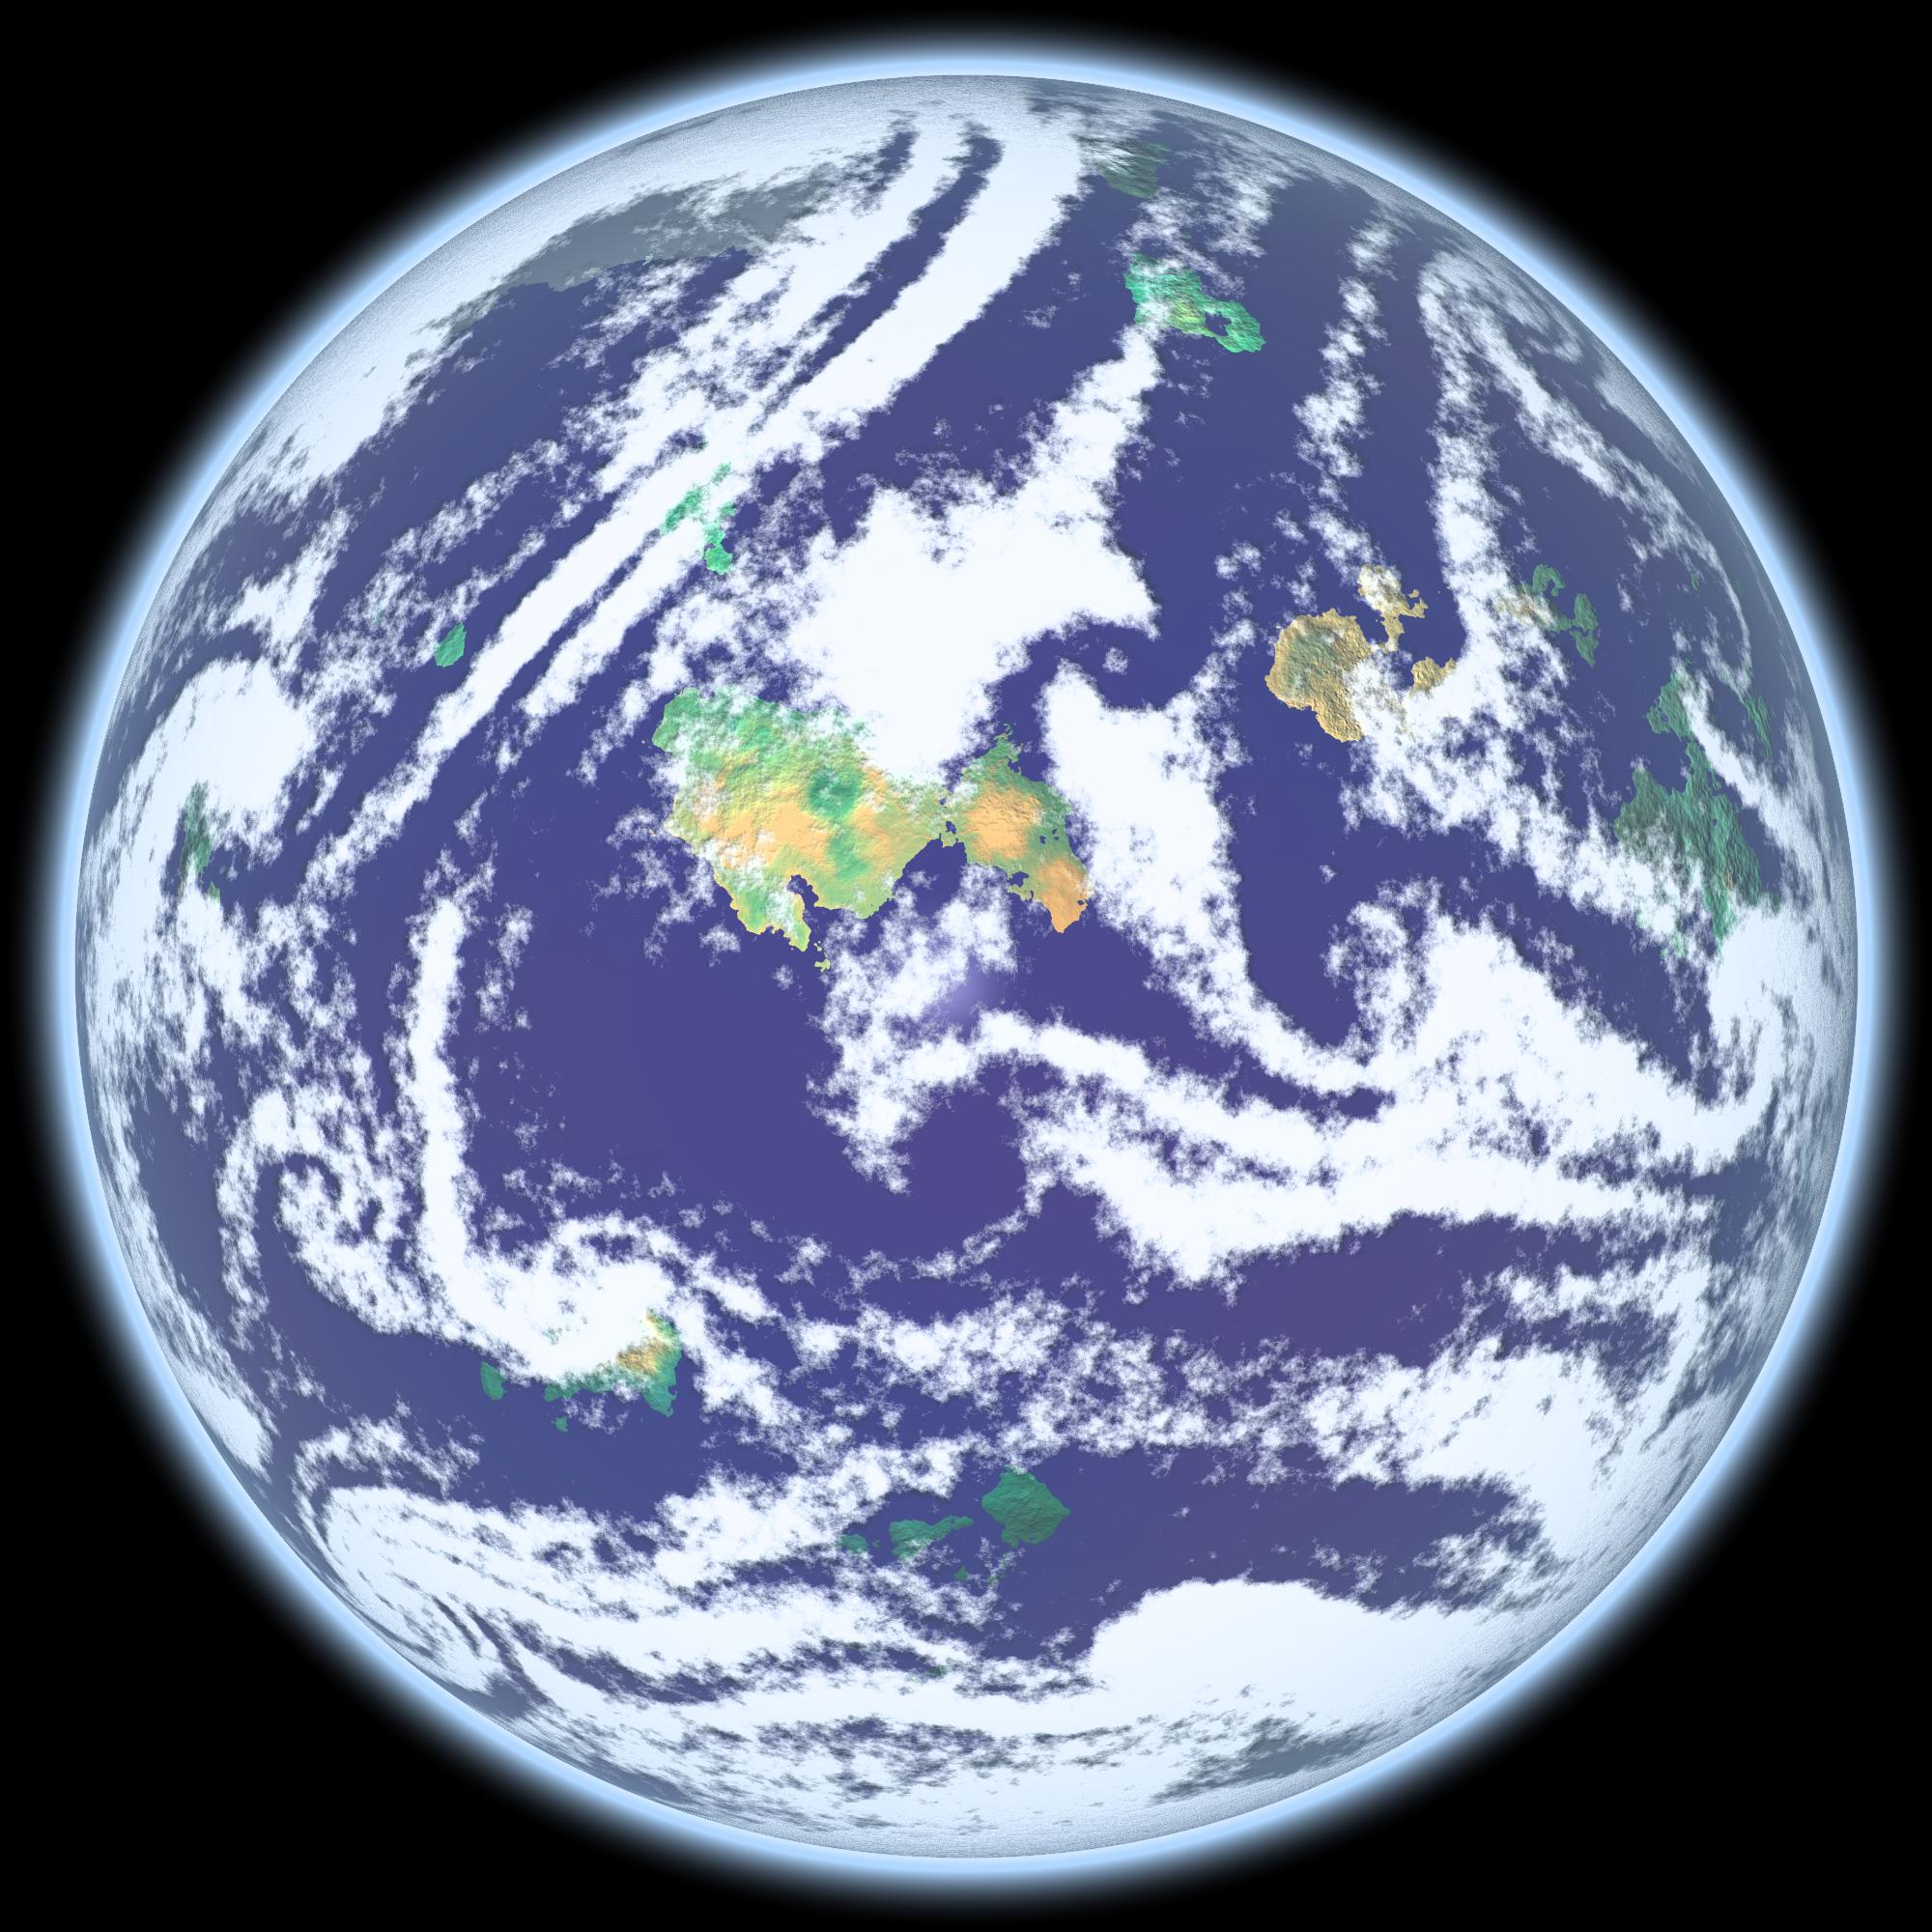 gliese 581 waterworld - photo #9